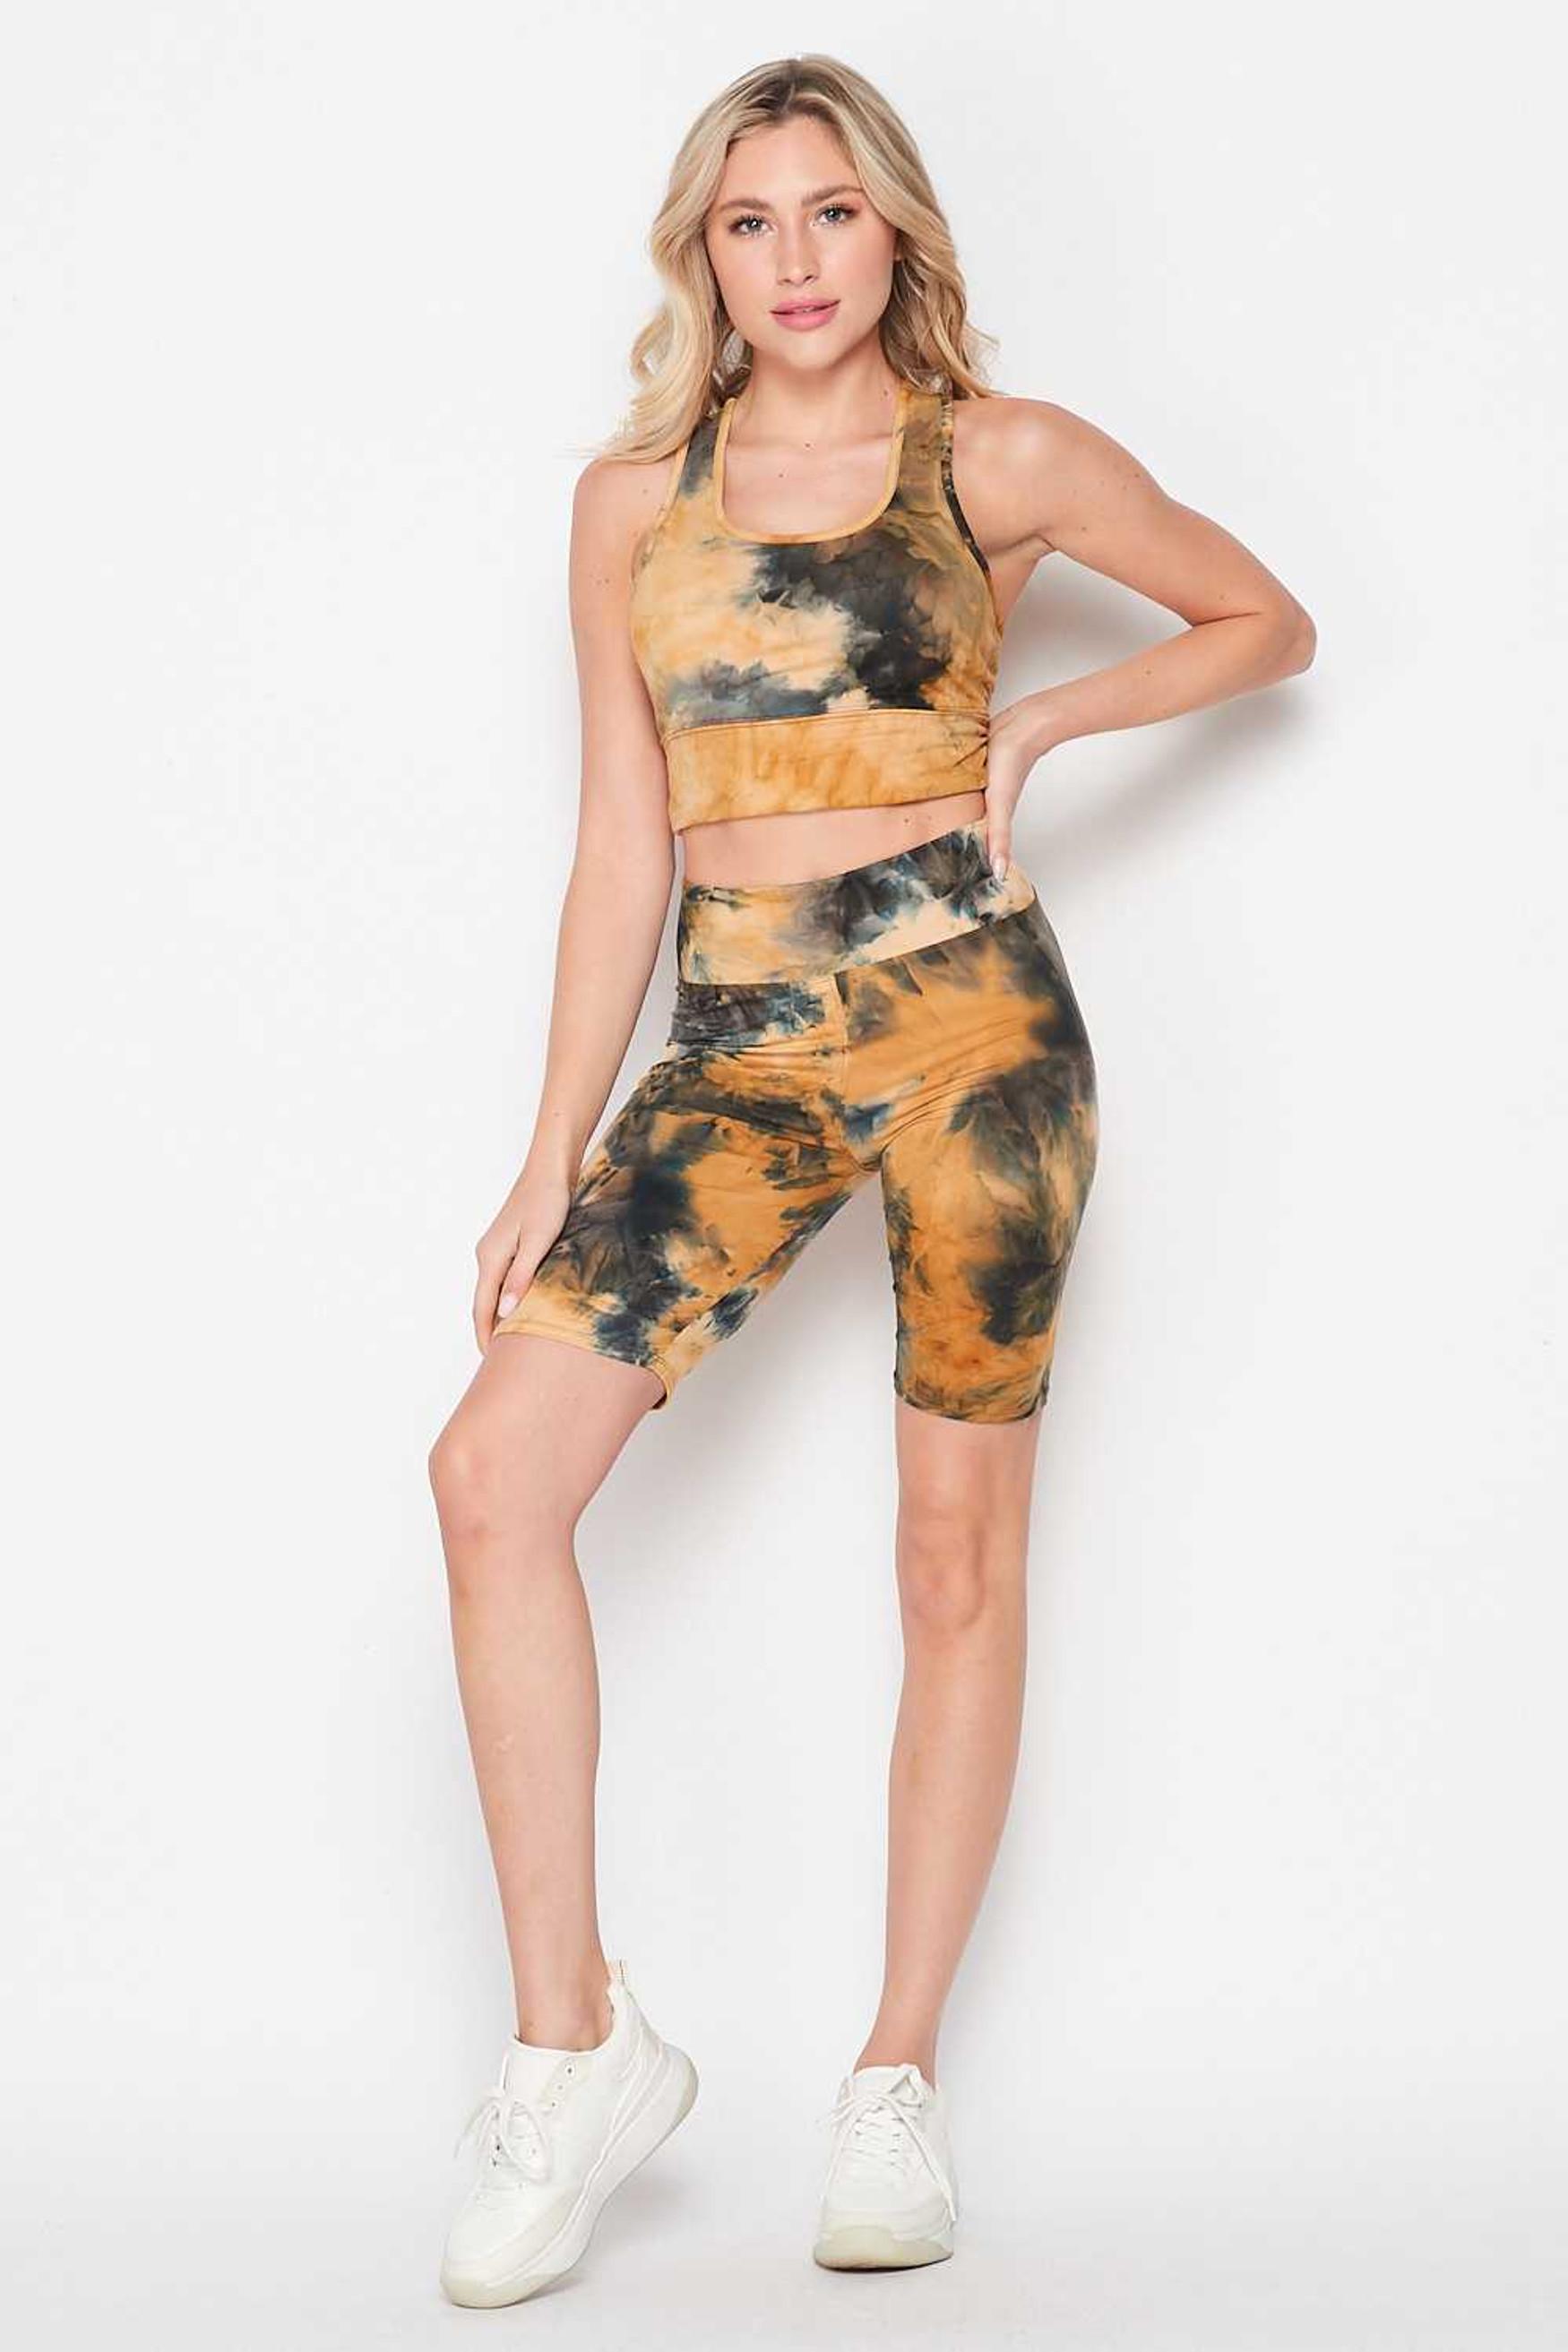 Camel Tie Dye 2 Piece High Waisted Biker Shorts and Crop Top Set